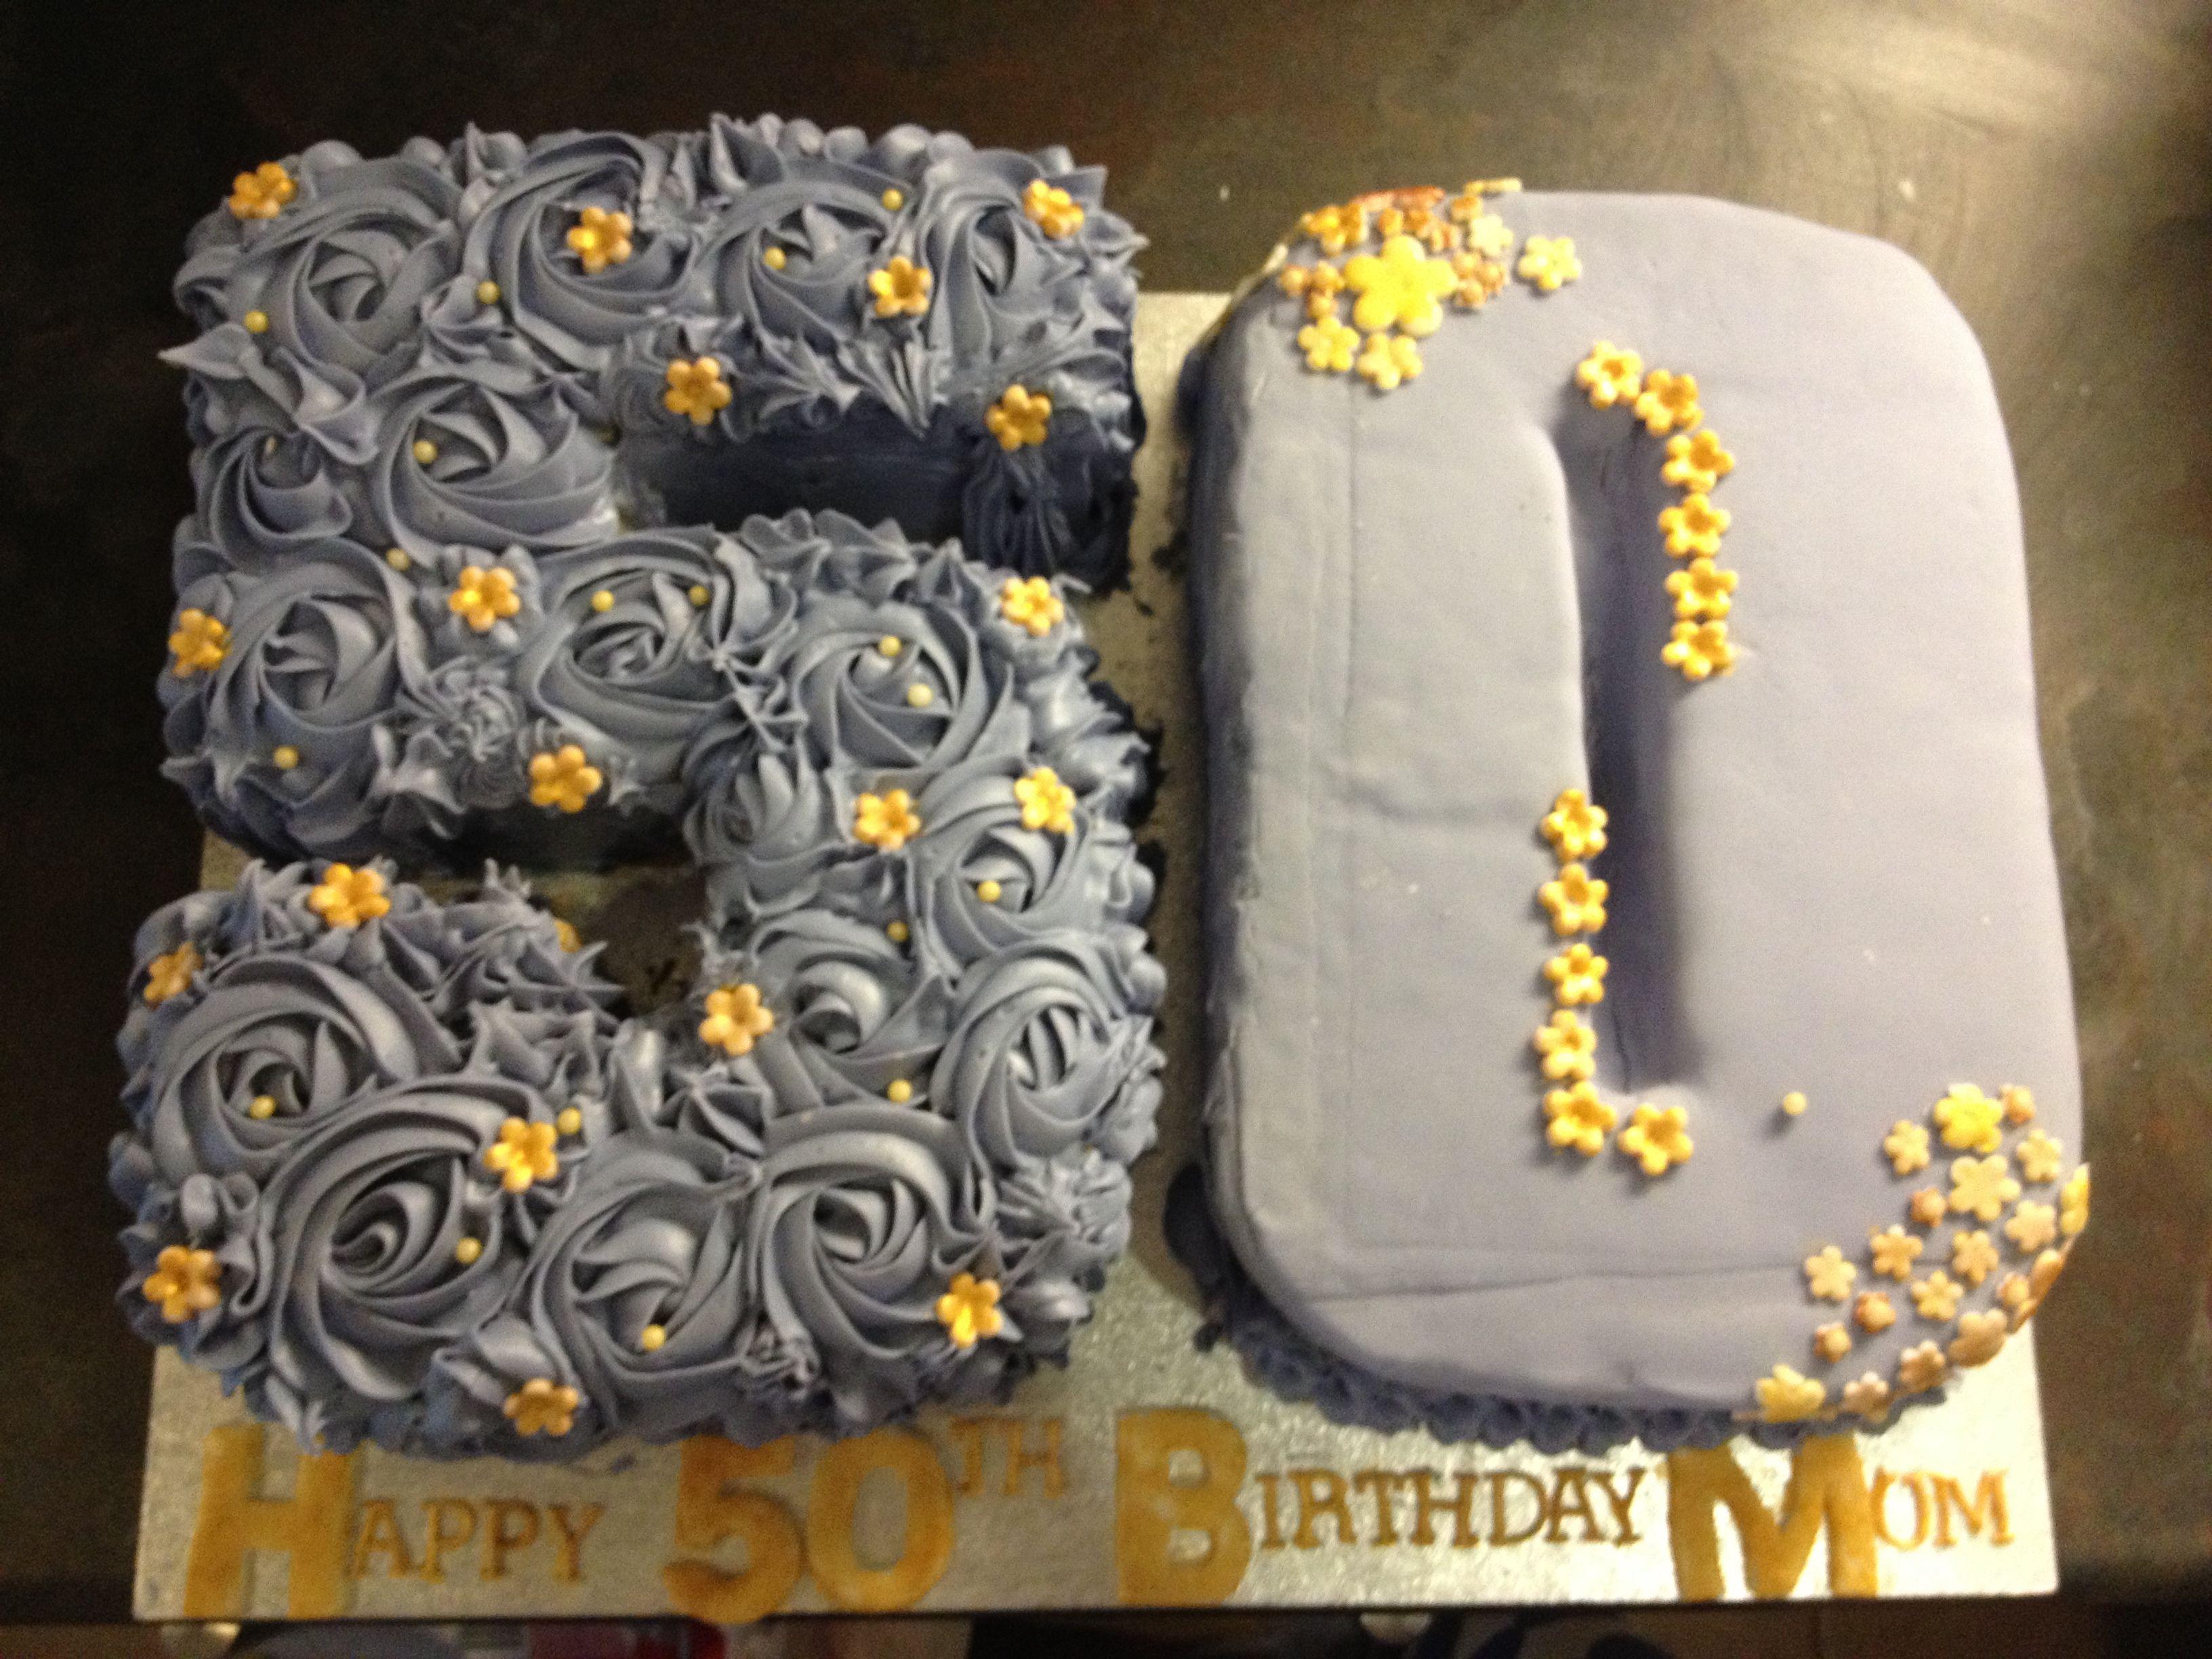 Marvelous Number 50 Birthday Cake Purple And Gold Buttercream Rose Swirls Personalised Birthday Cards Sponlily Jamesorg